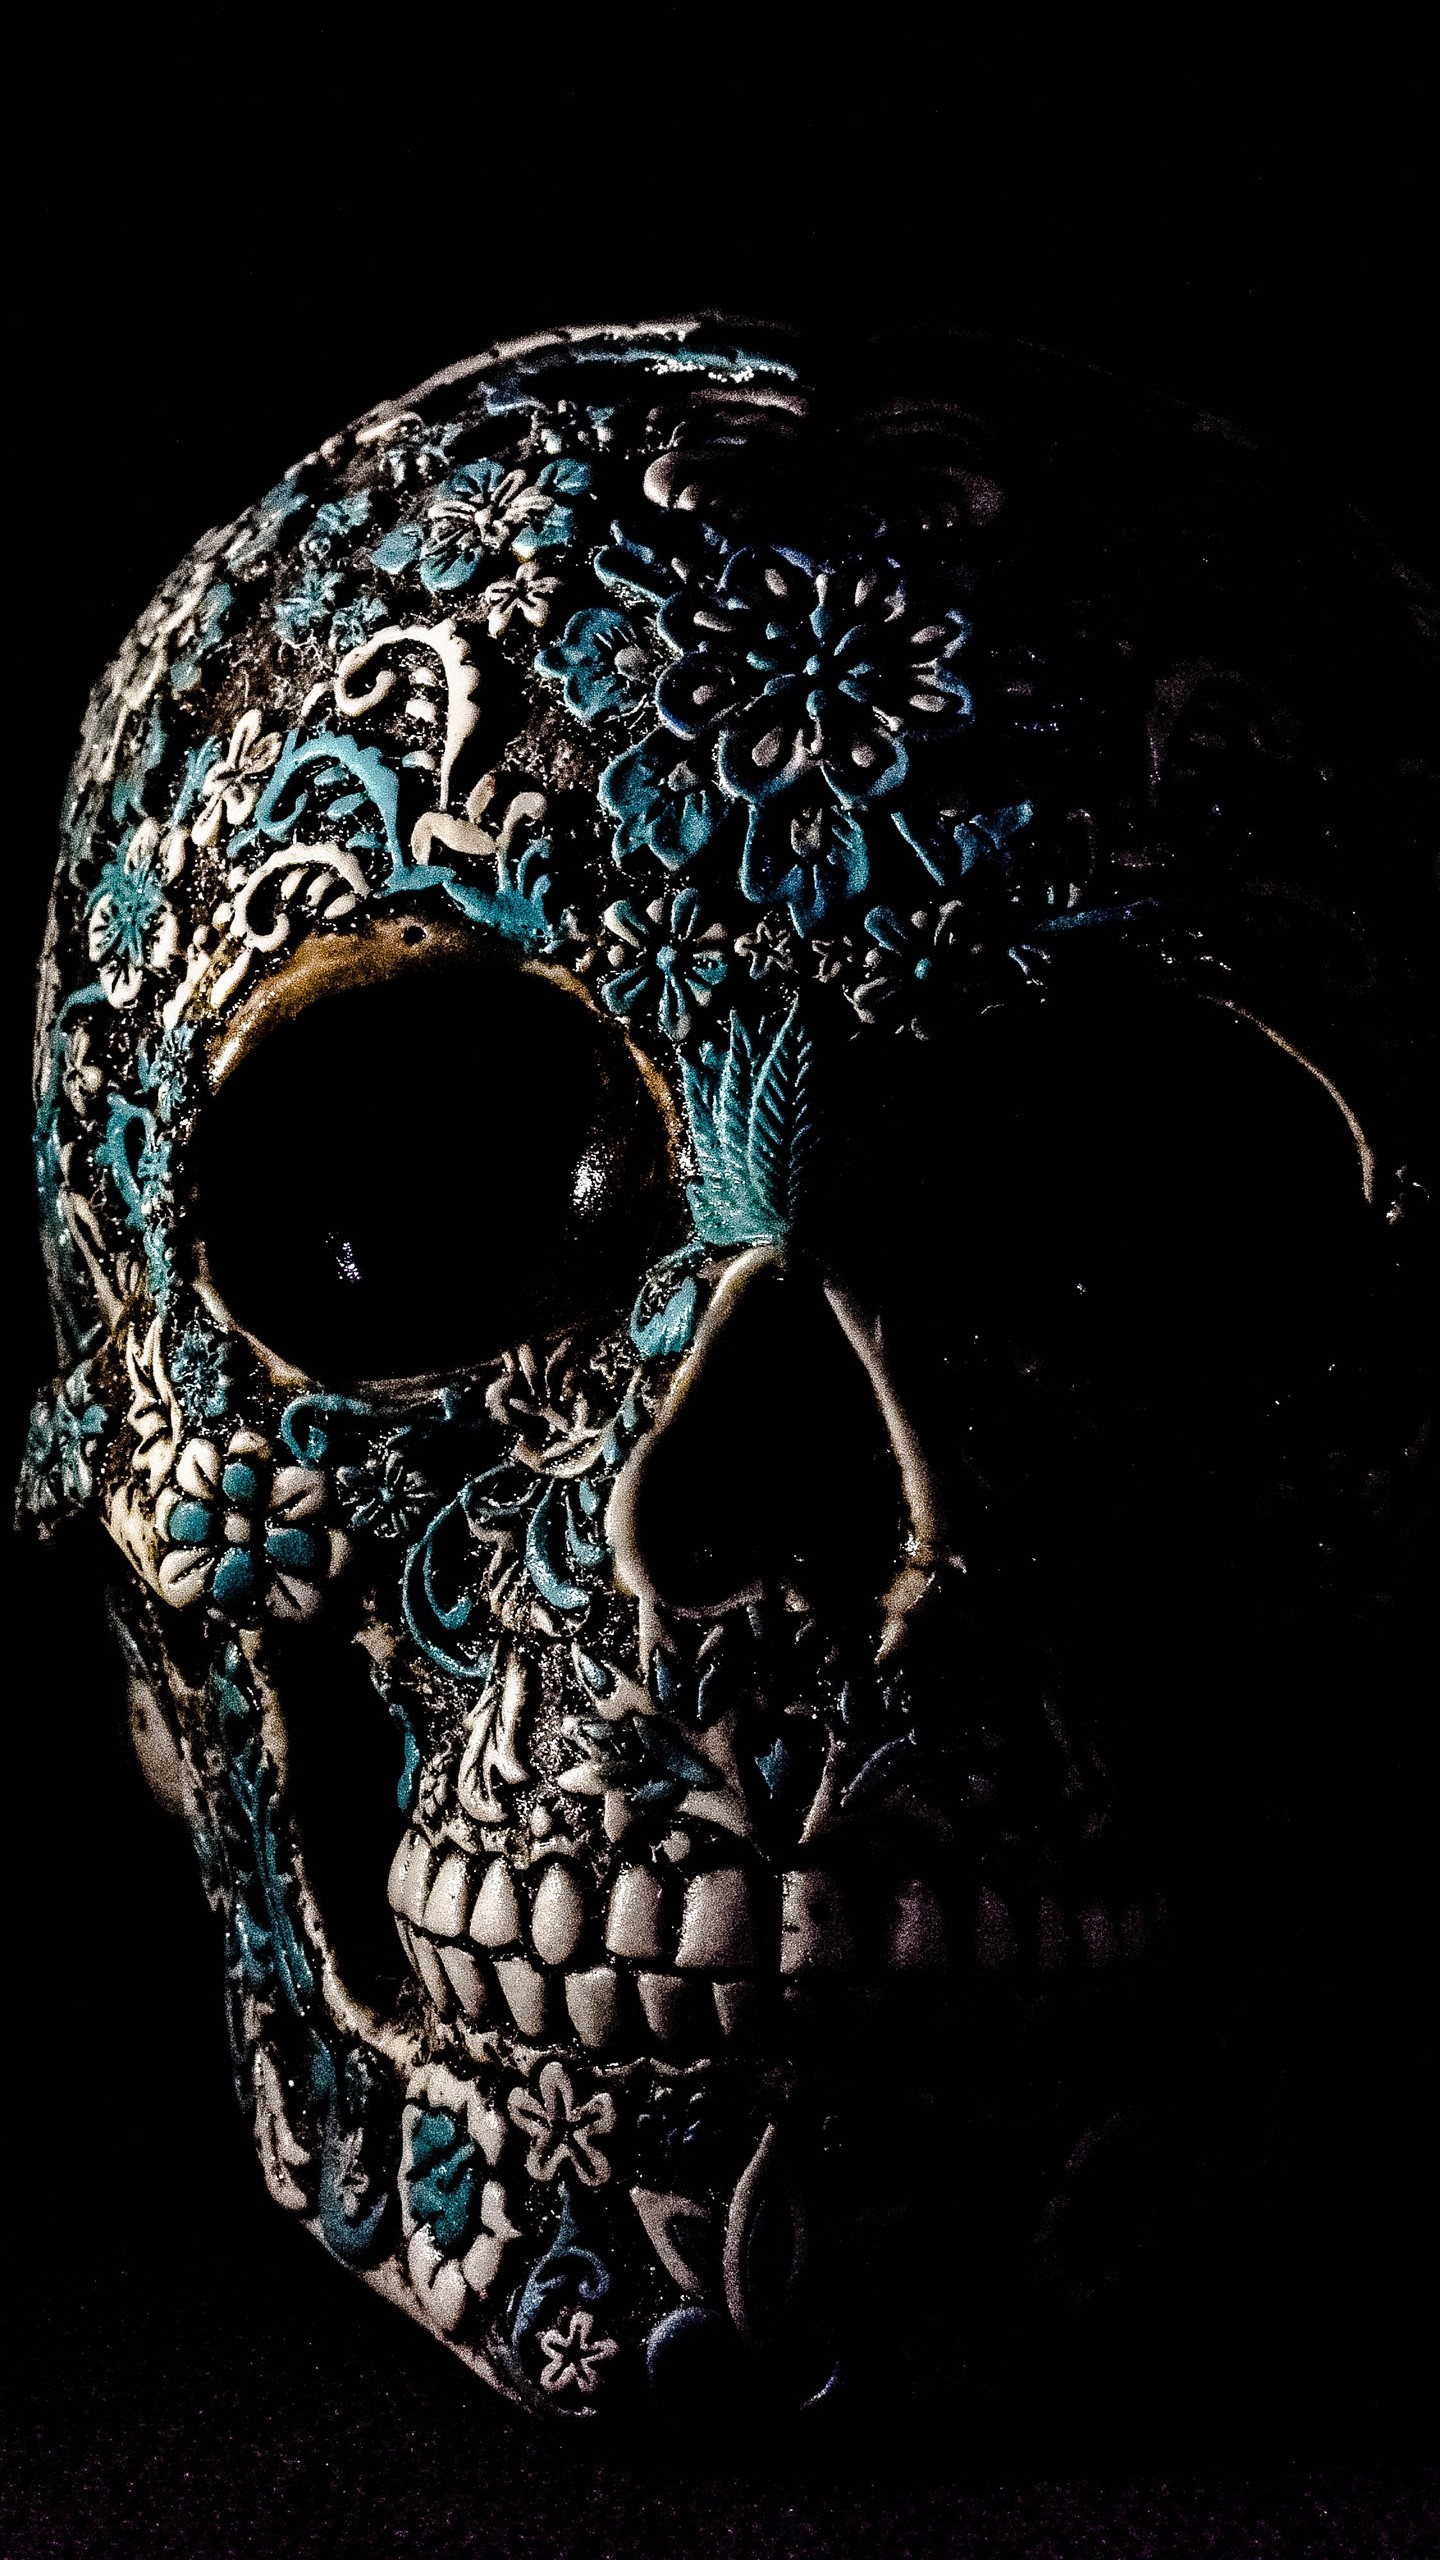 Skull Wallpapers For Laptops 72 Images